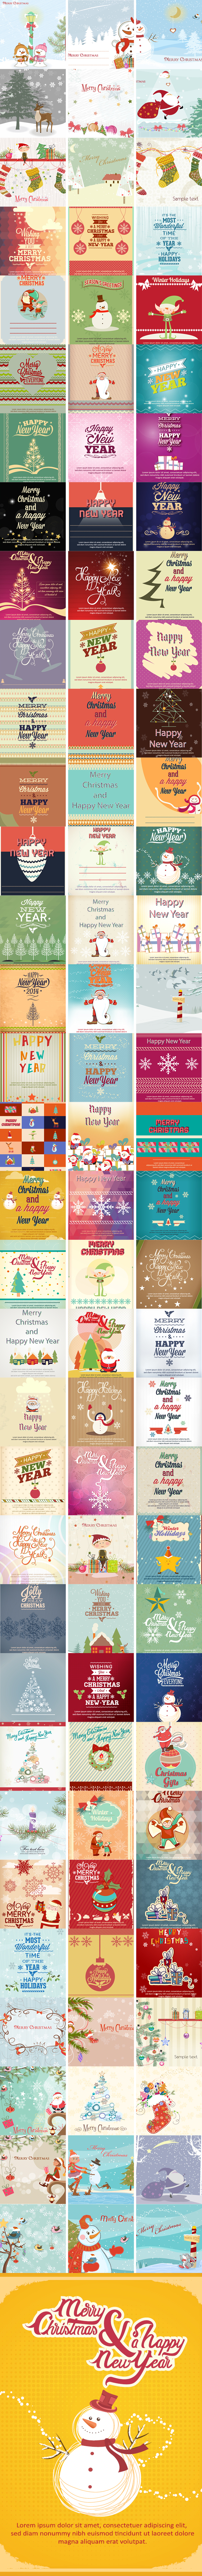 100-holiday-illustrations